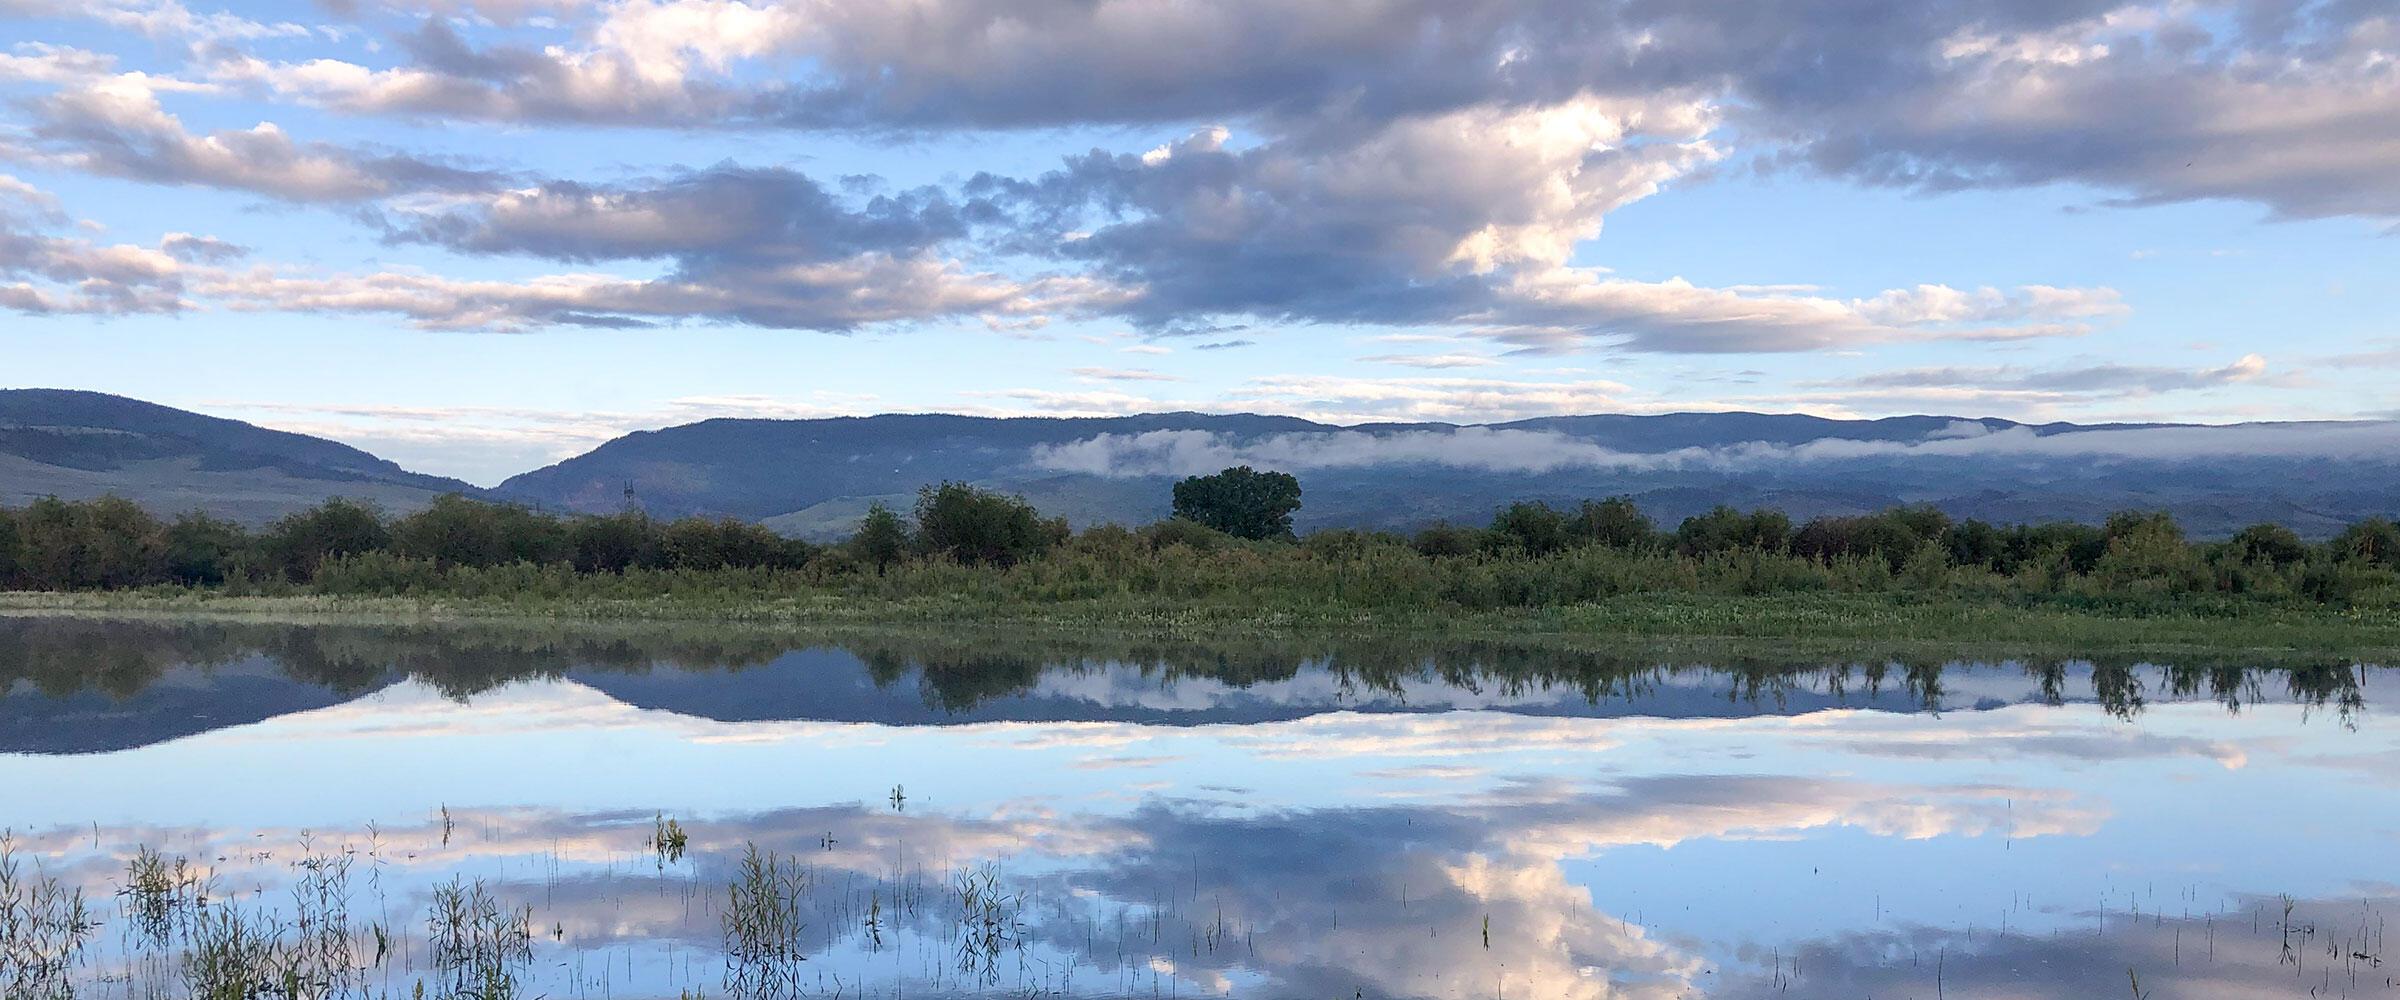 Sunrise over a wetland.